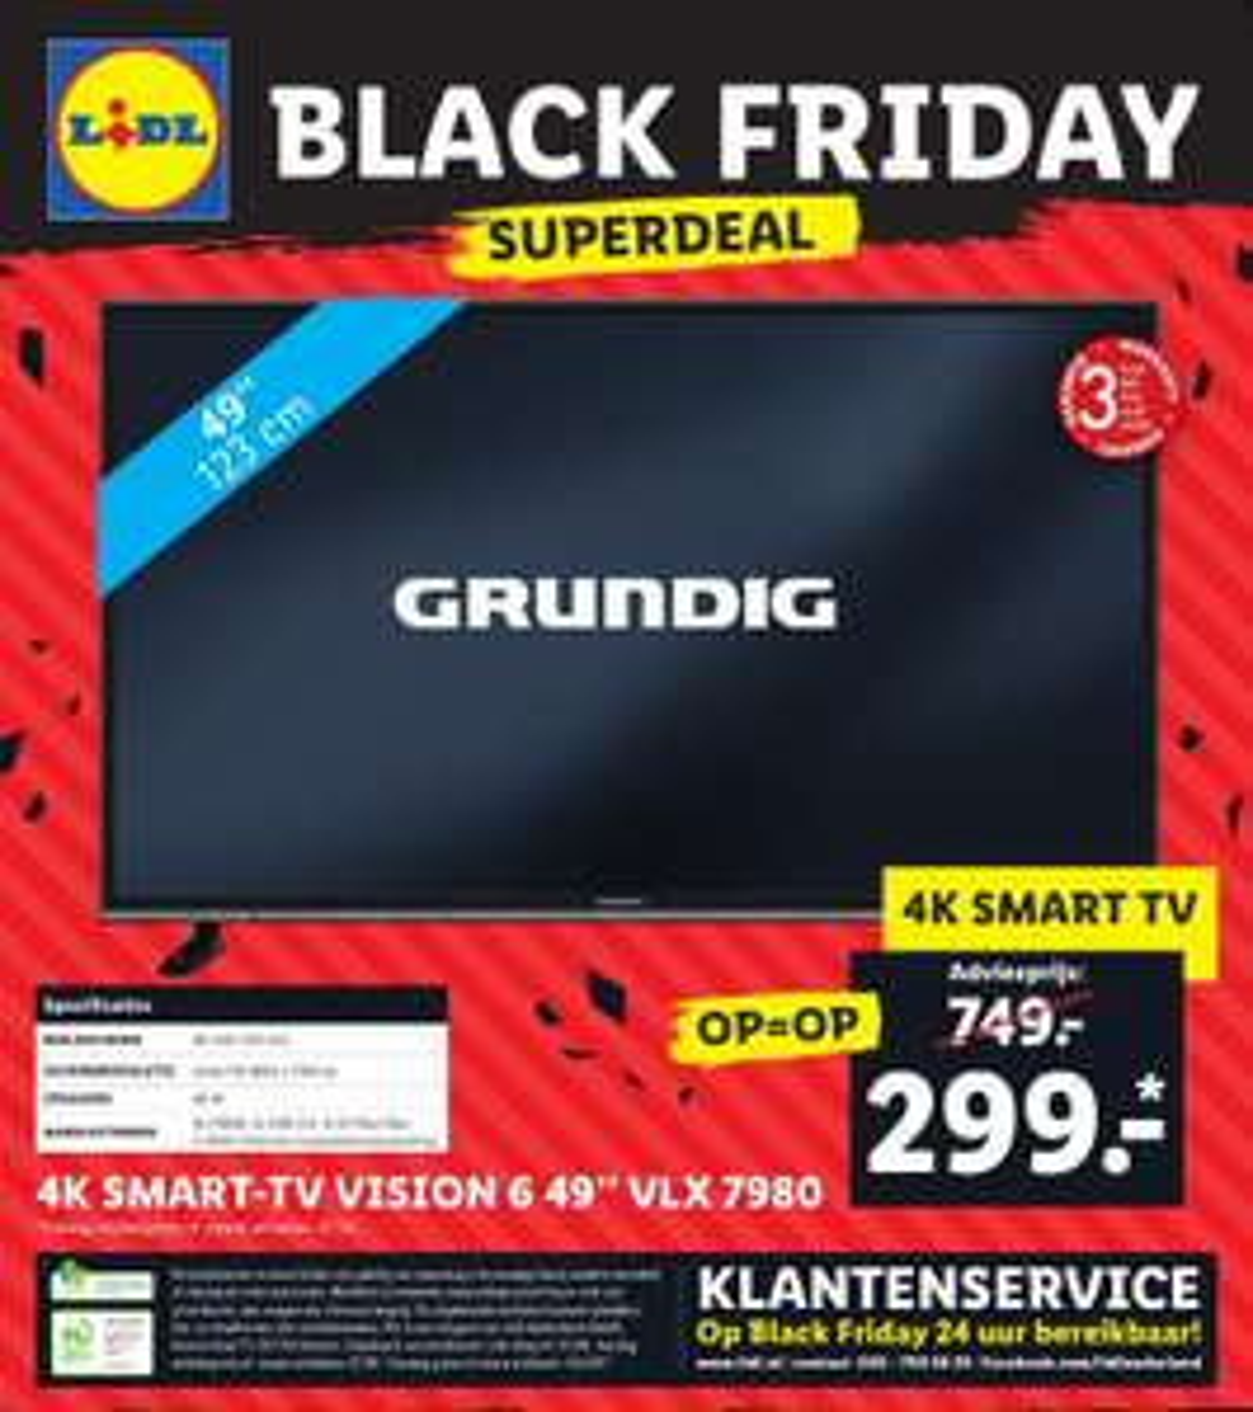 [Black Friday] 49 inch Grundig 4K-televisie @ Lidl